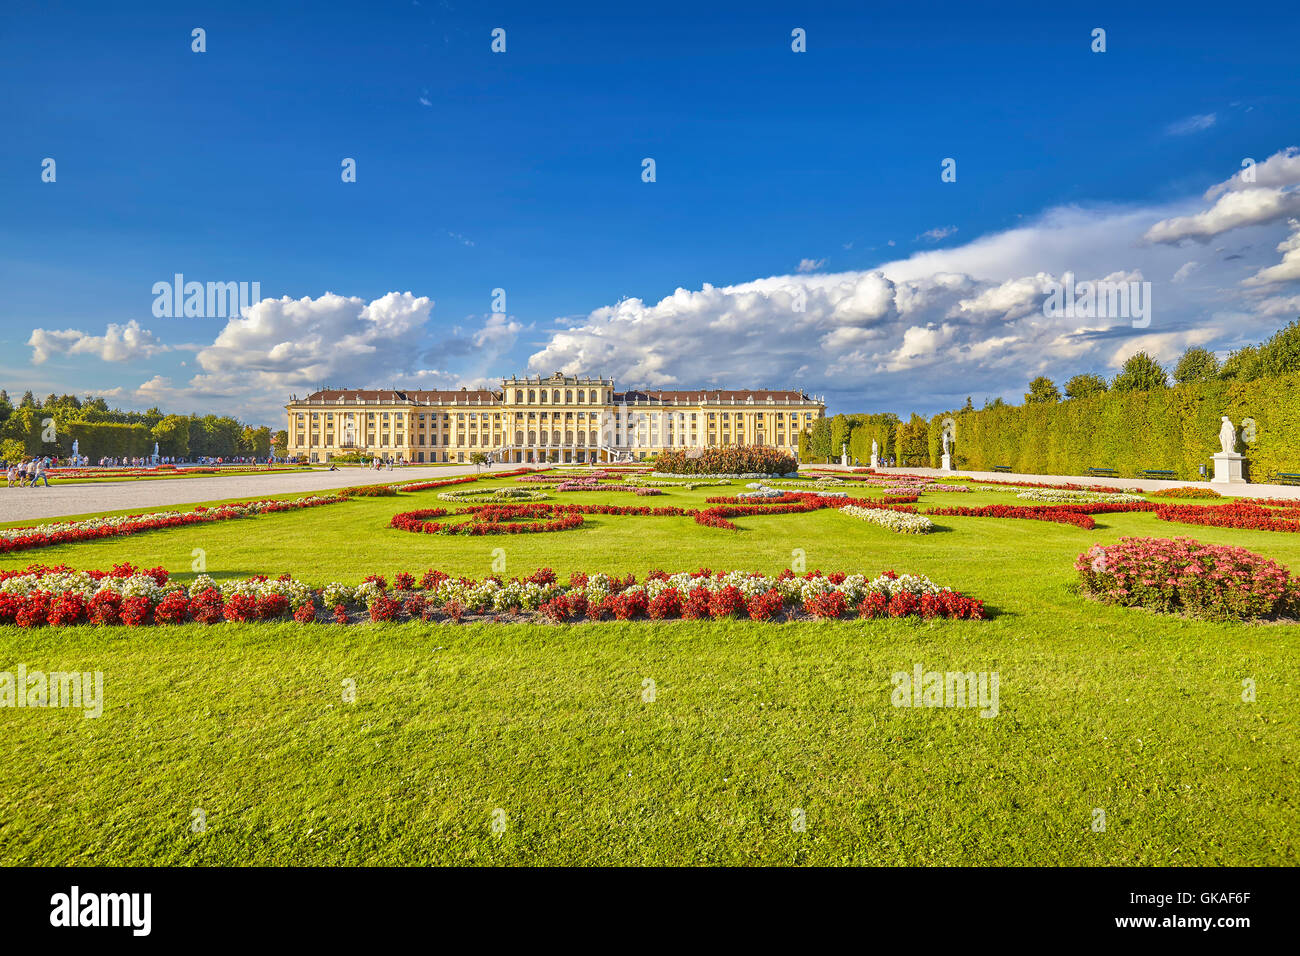 Dans le jardin du palais Schönbrunn complexe. Photo Stock